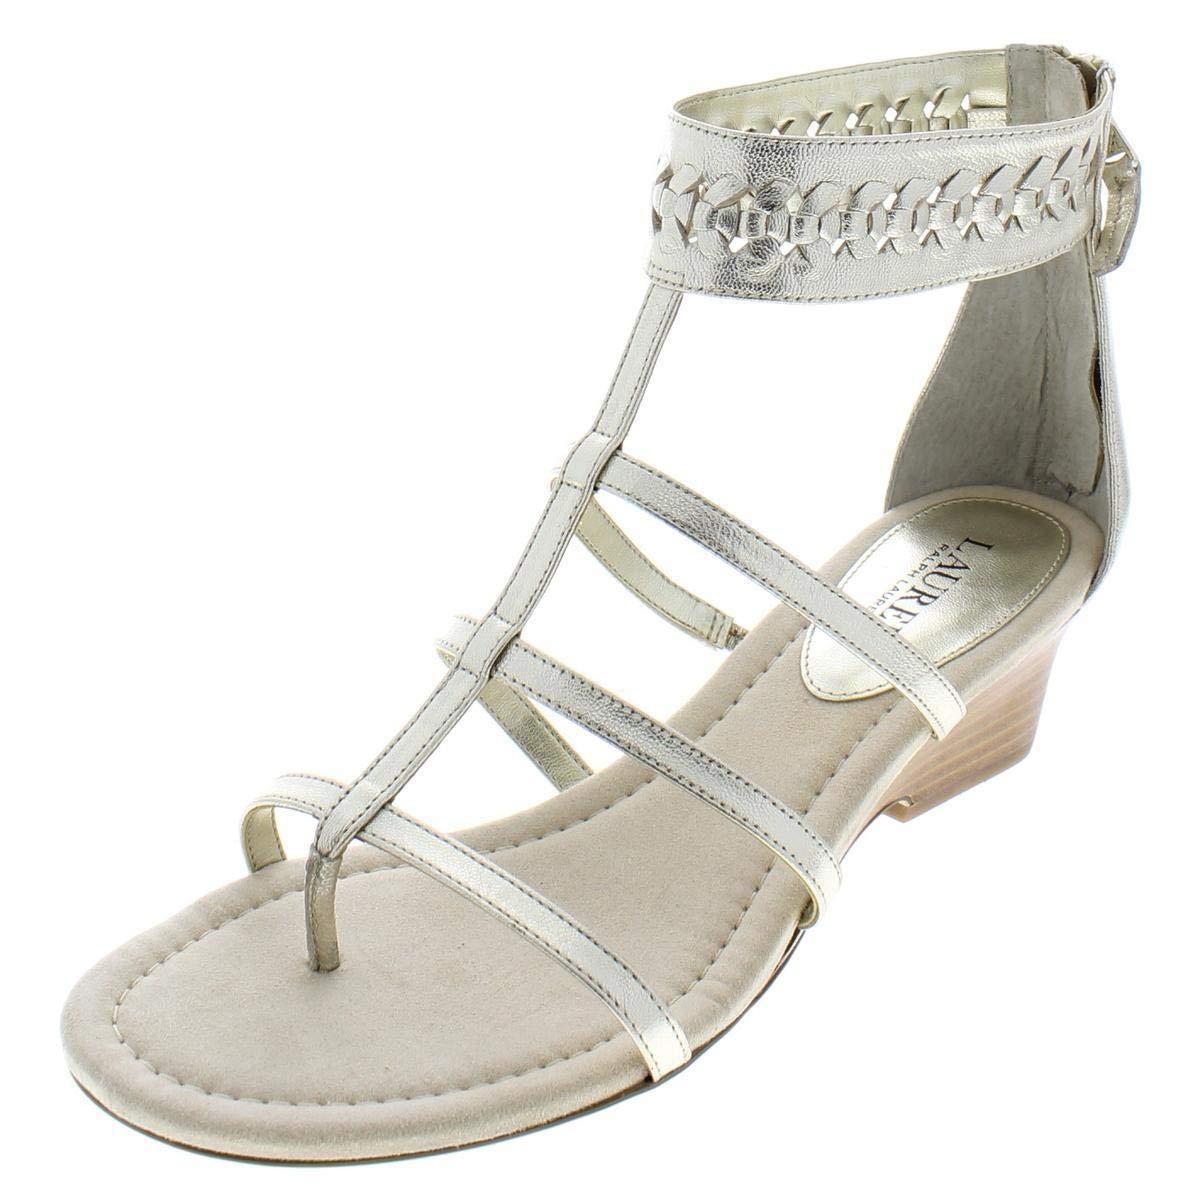 LAUREN by Ralph Lauren donna Meira Open Toe Casual Ankle Strap Sandals